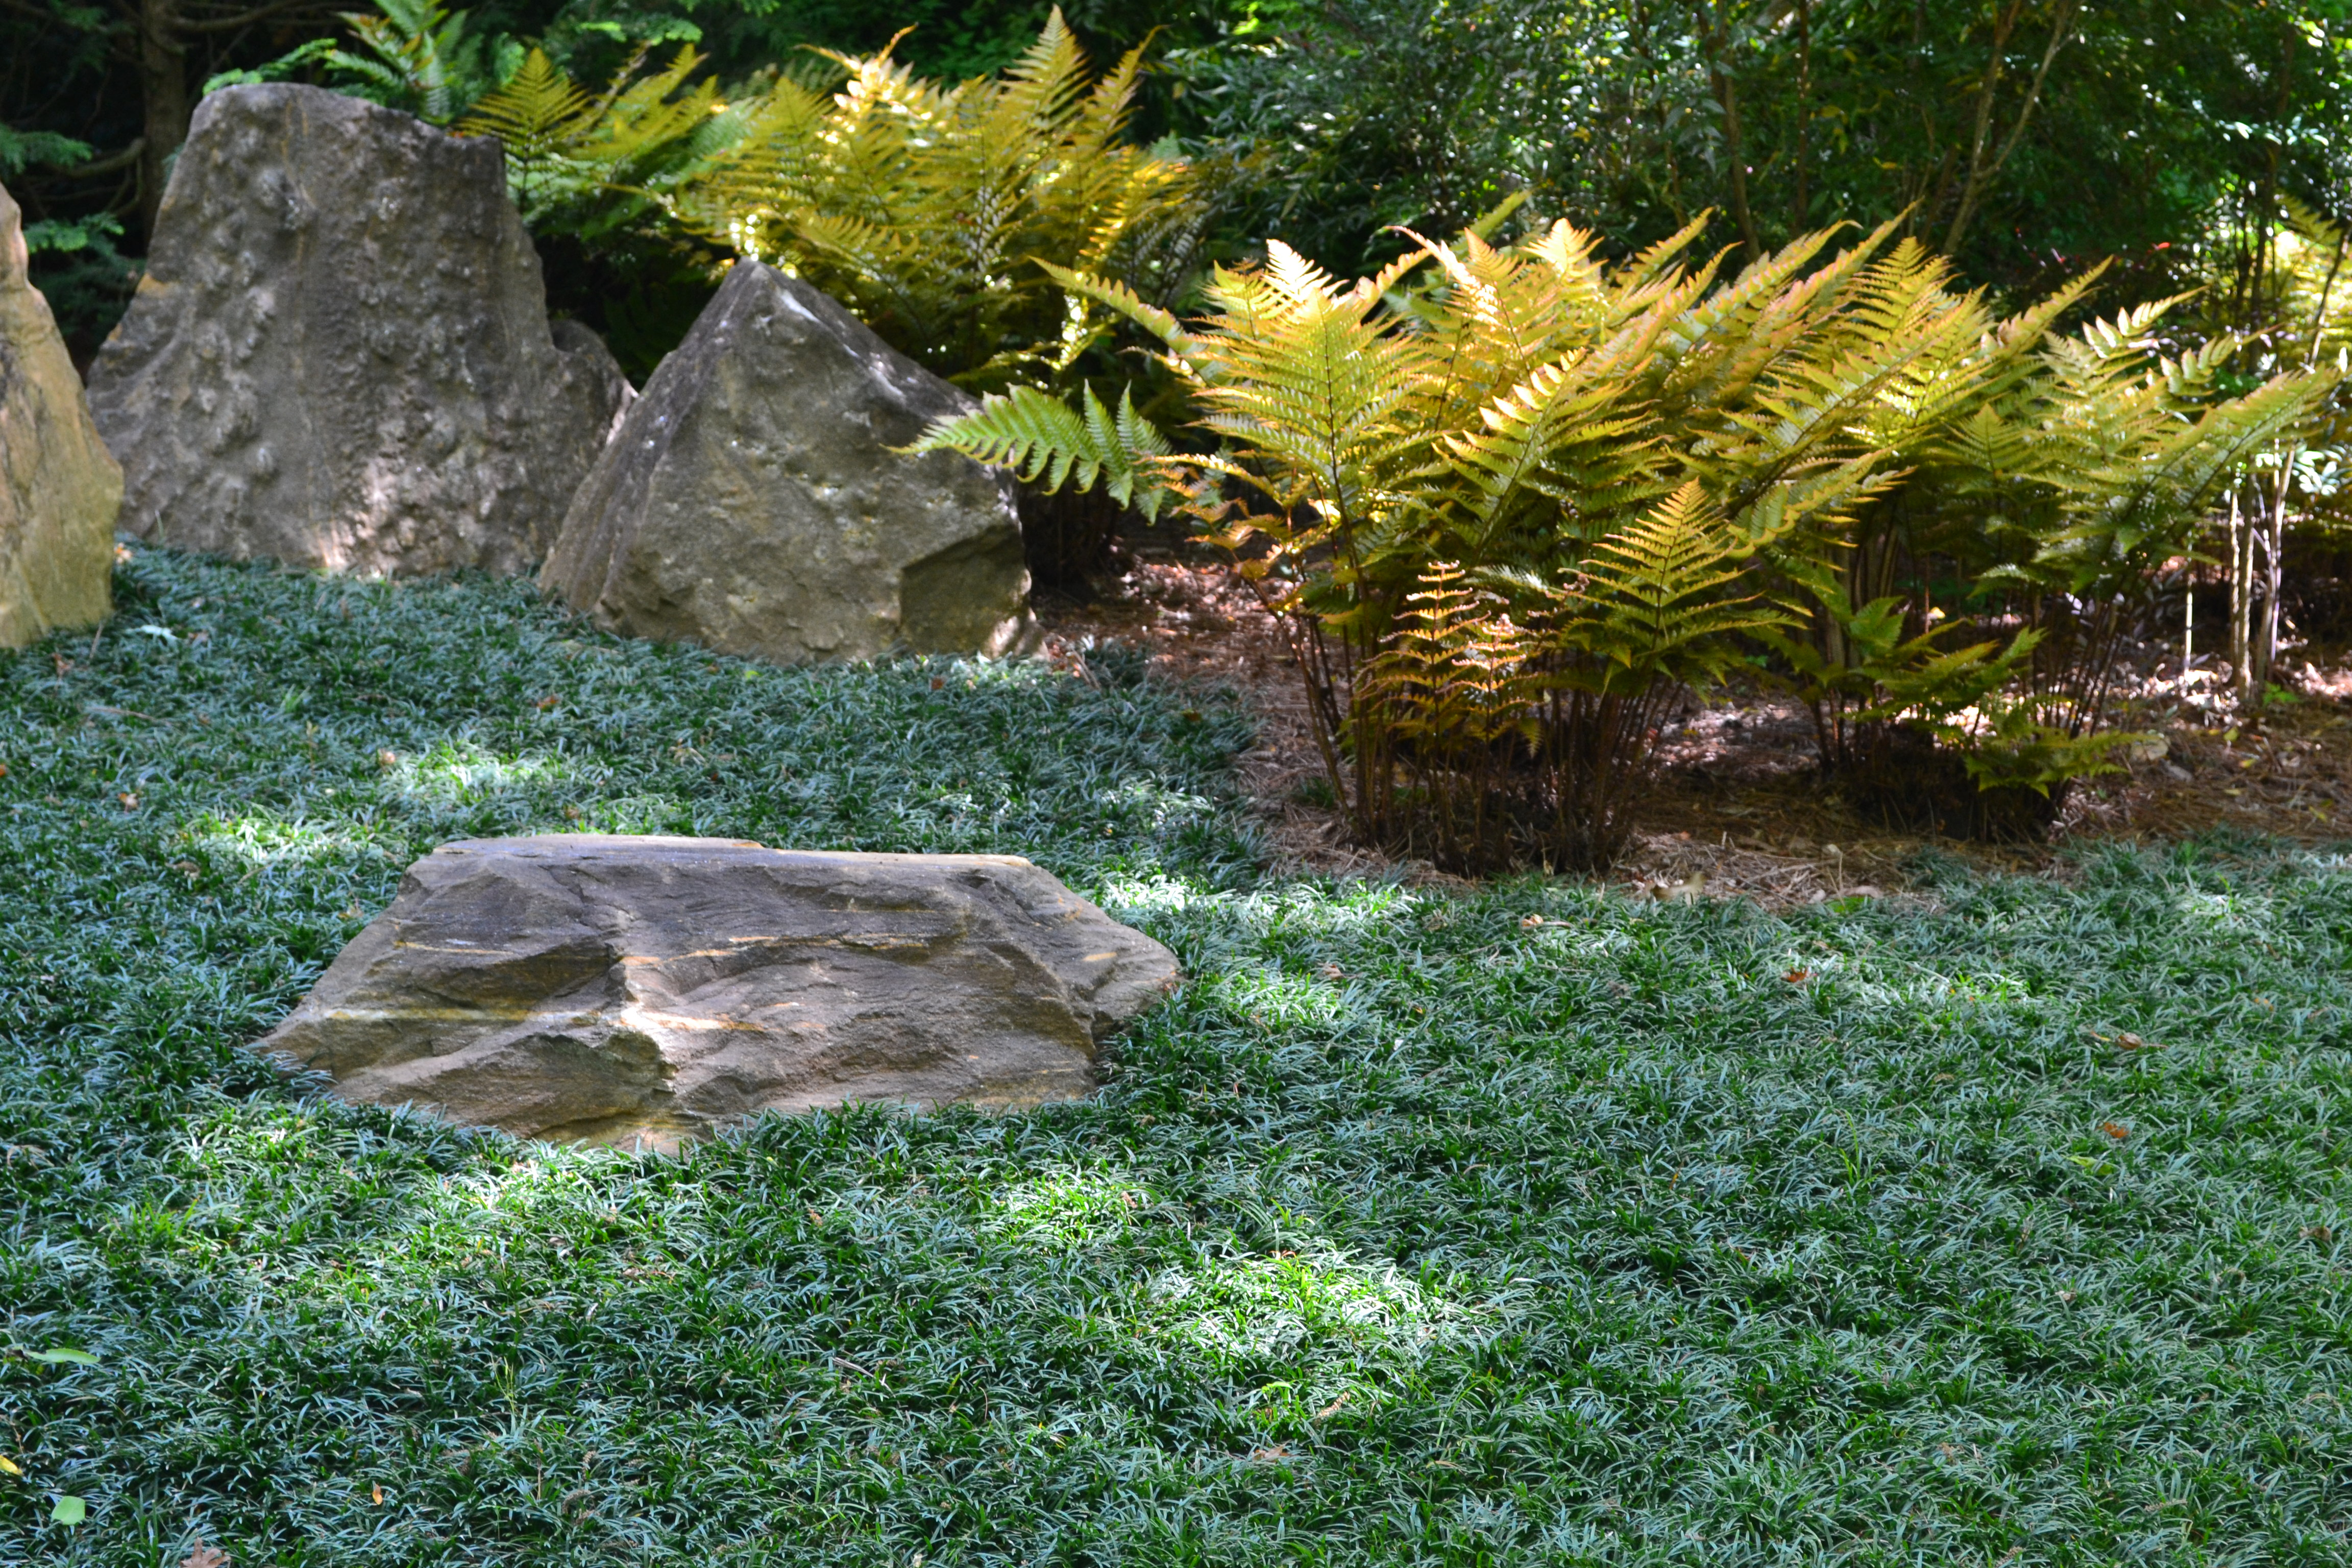 Dwarf Mondo and Ferns - Hillary Thompson pic